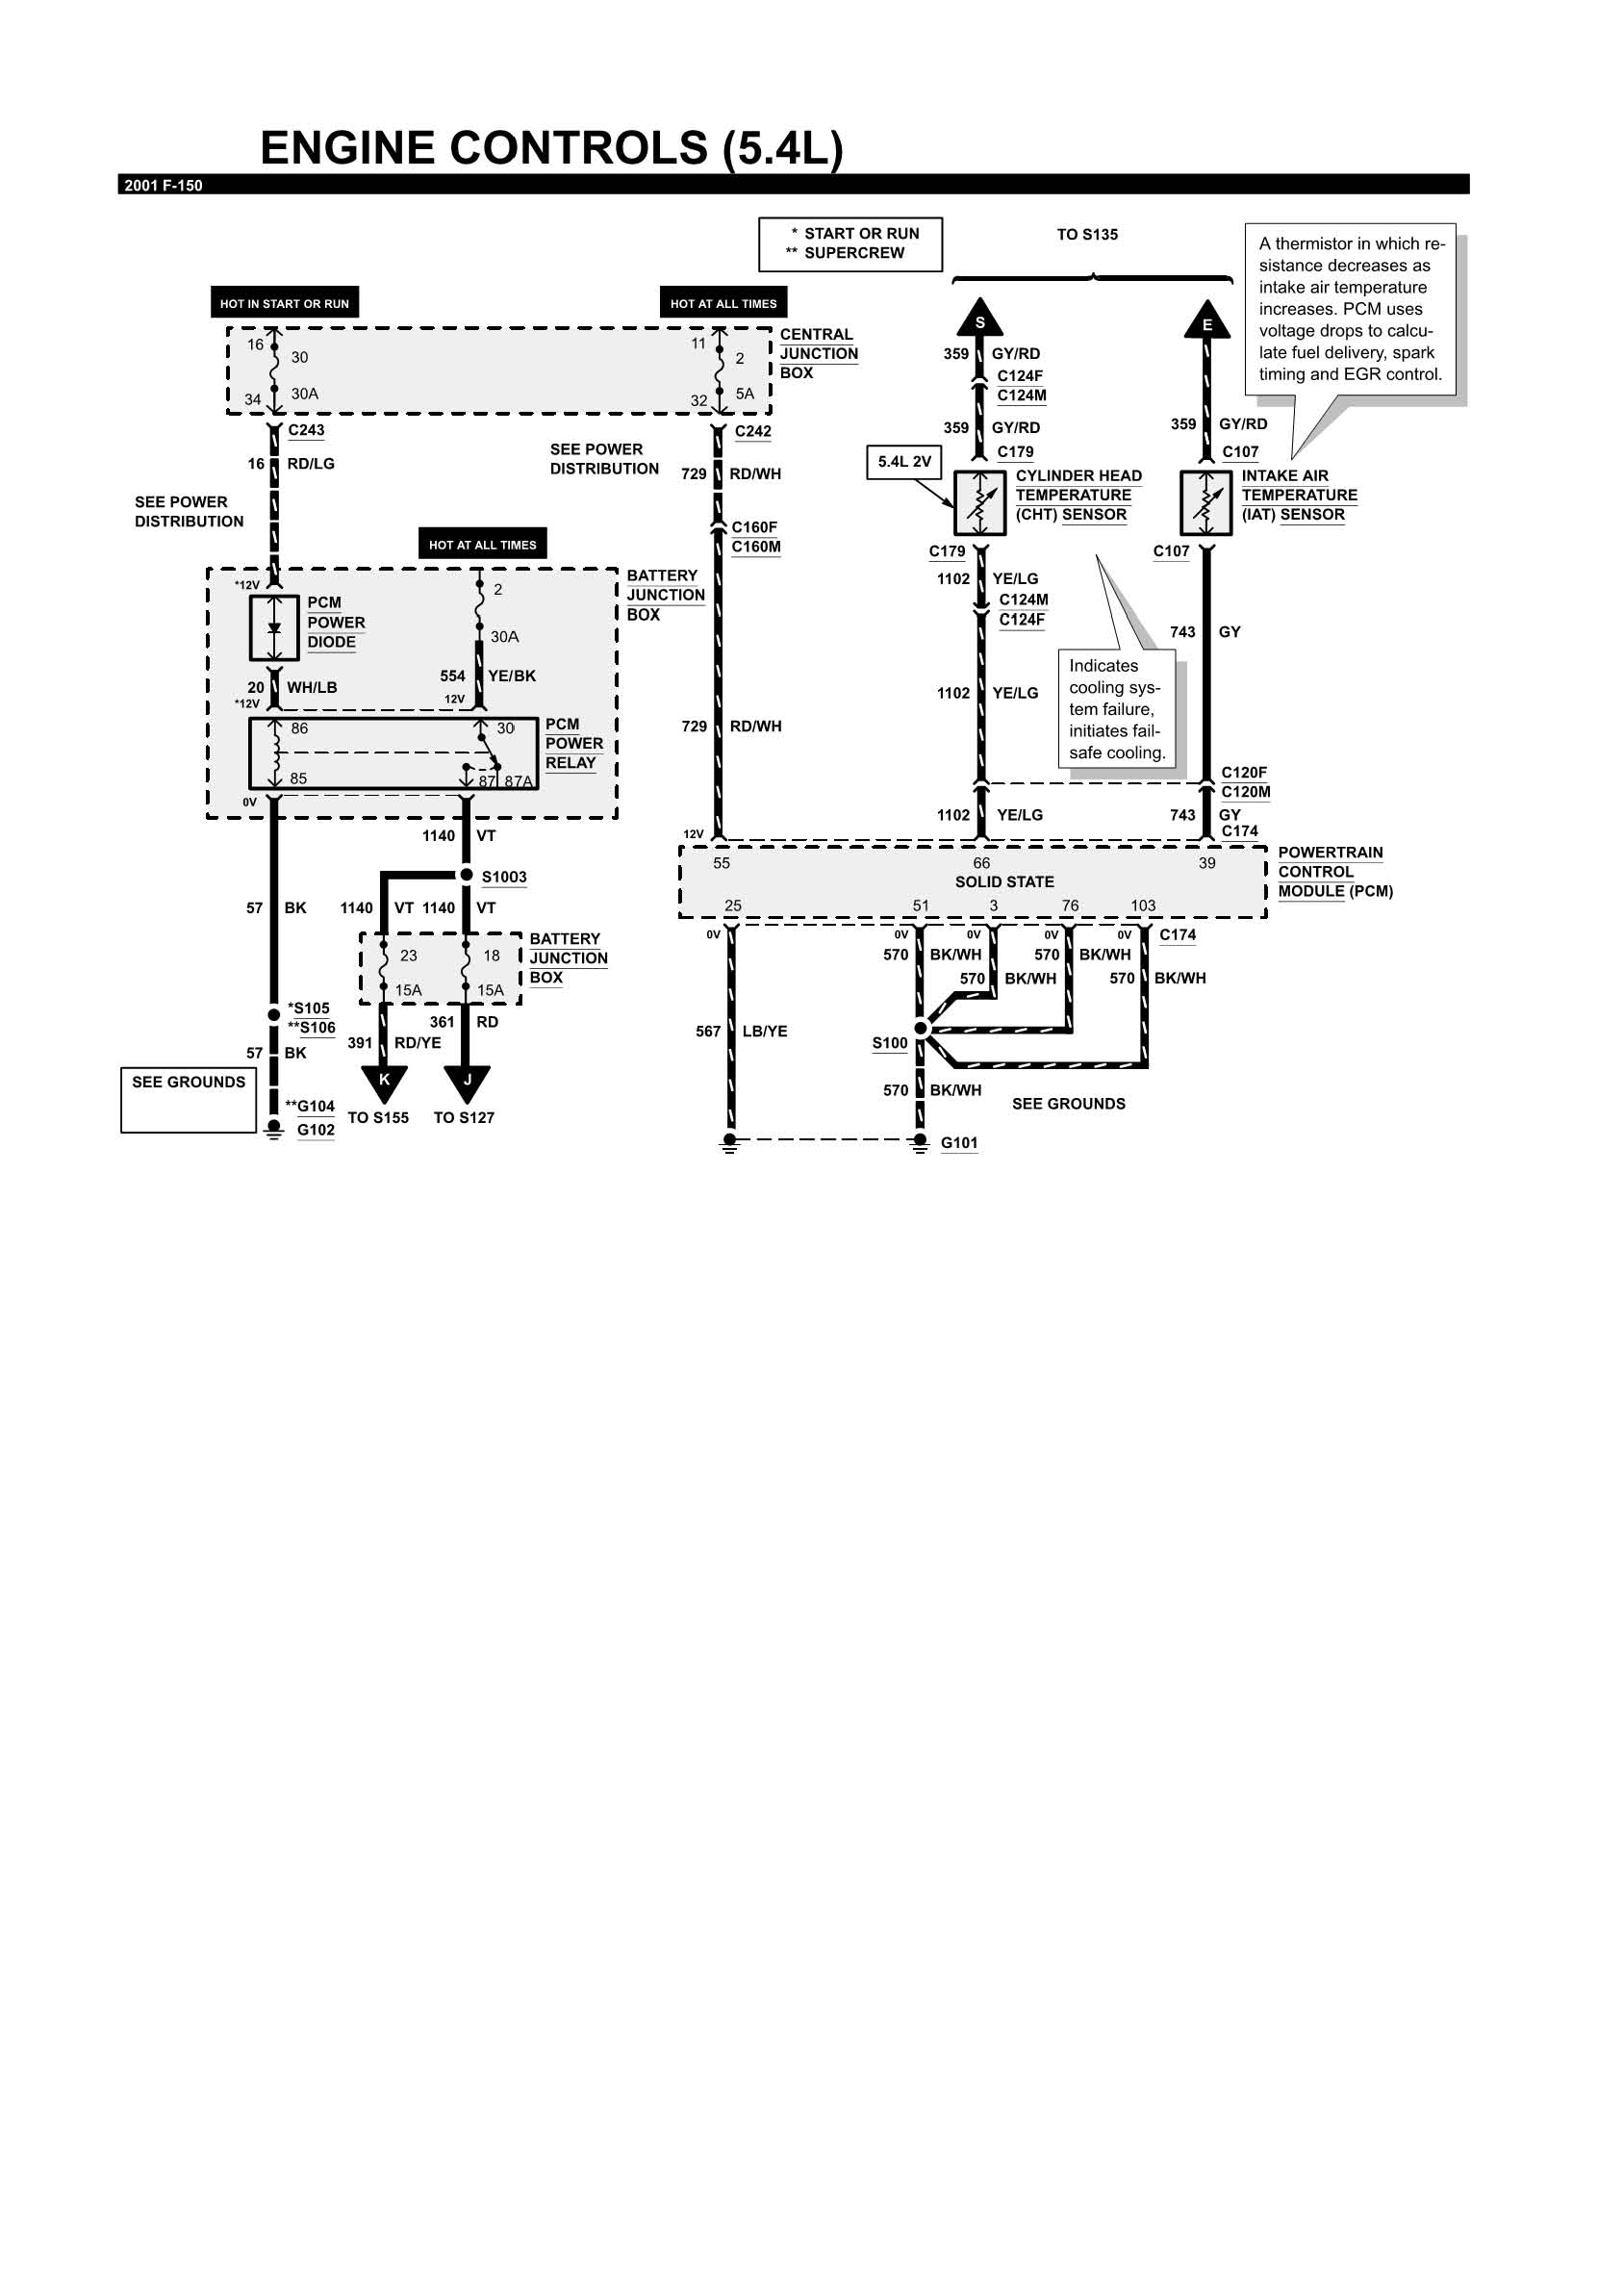 Admirable 06 F150 Pats Wiring Diagram Wiring Diagram Database Wiring Cloud Hemtshollocom